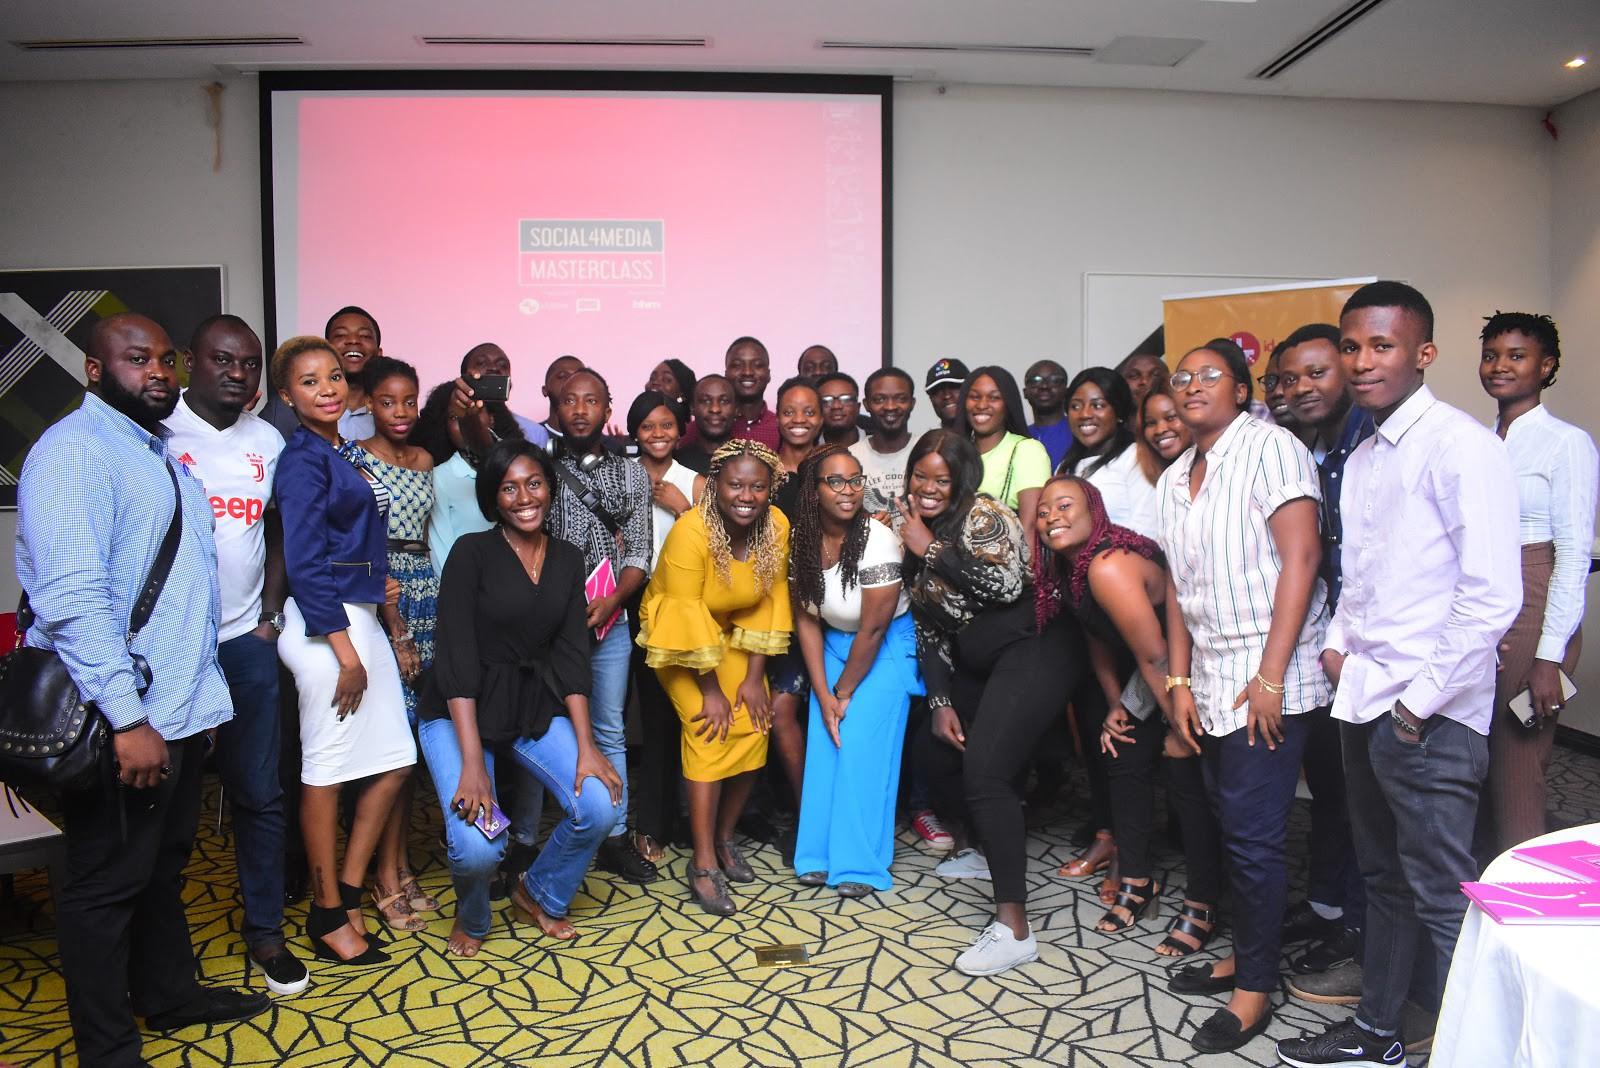 Gbemi O, SLKomedy, Femi Bakre, Fu'ad Lawal, Others Train Over 50 Media Professionals At 2019 Social4Media Masterclass - Brand Spur